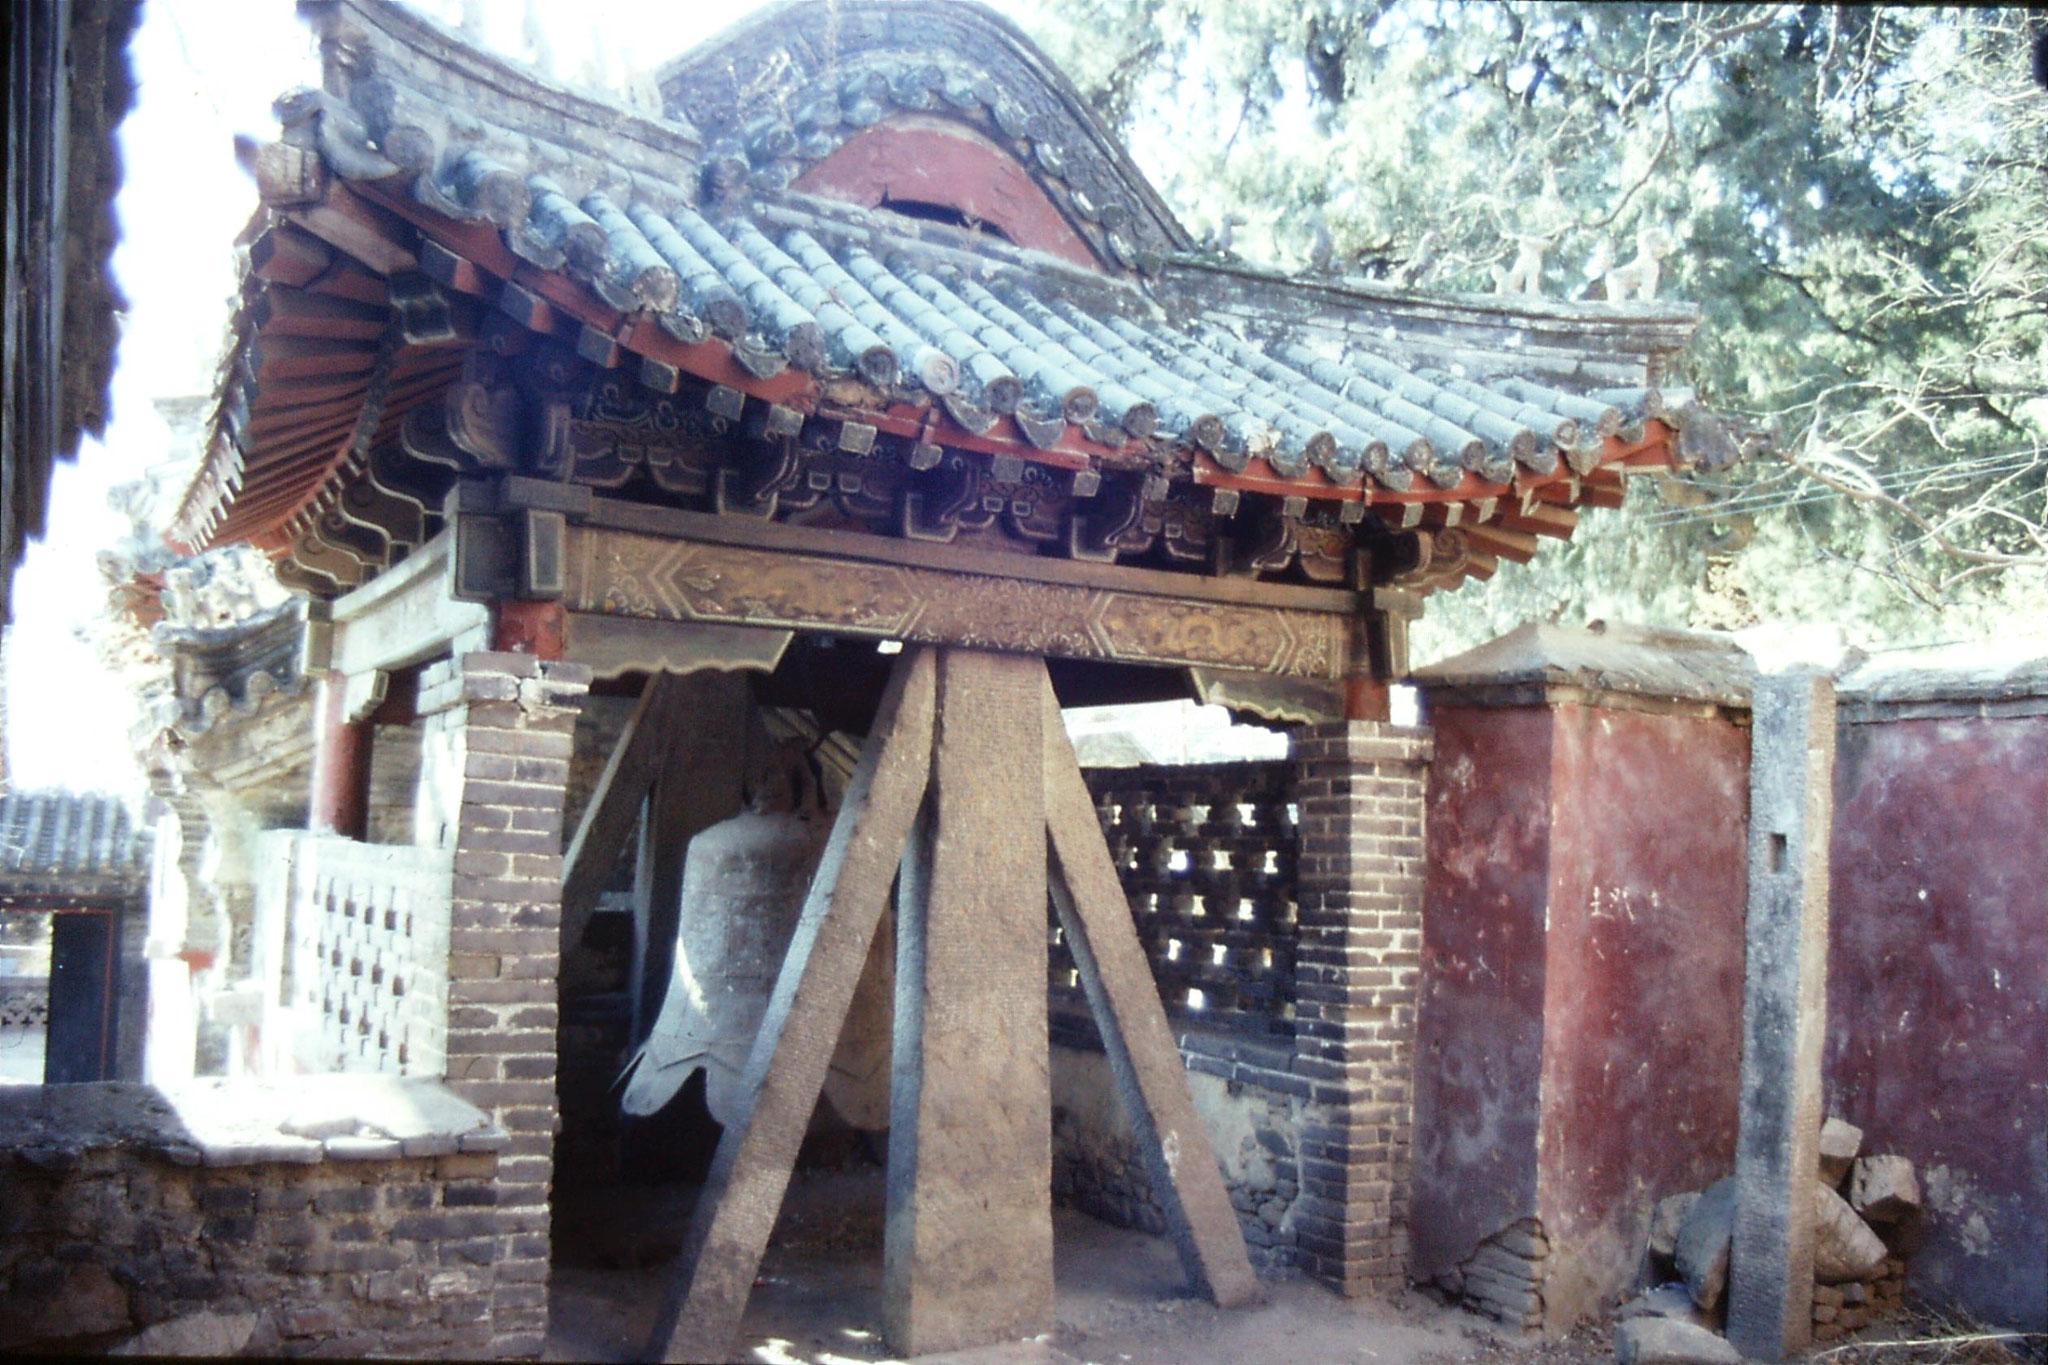 18/2/1989: 15: Taishan bell tower